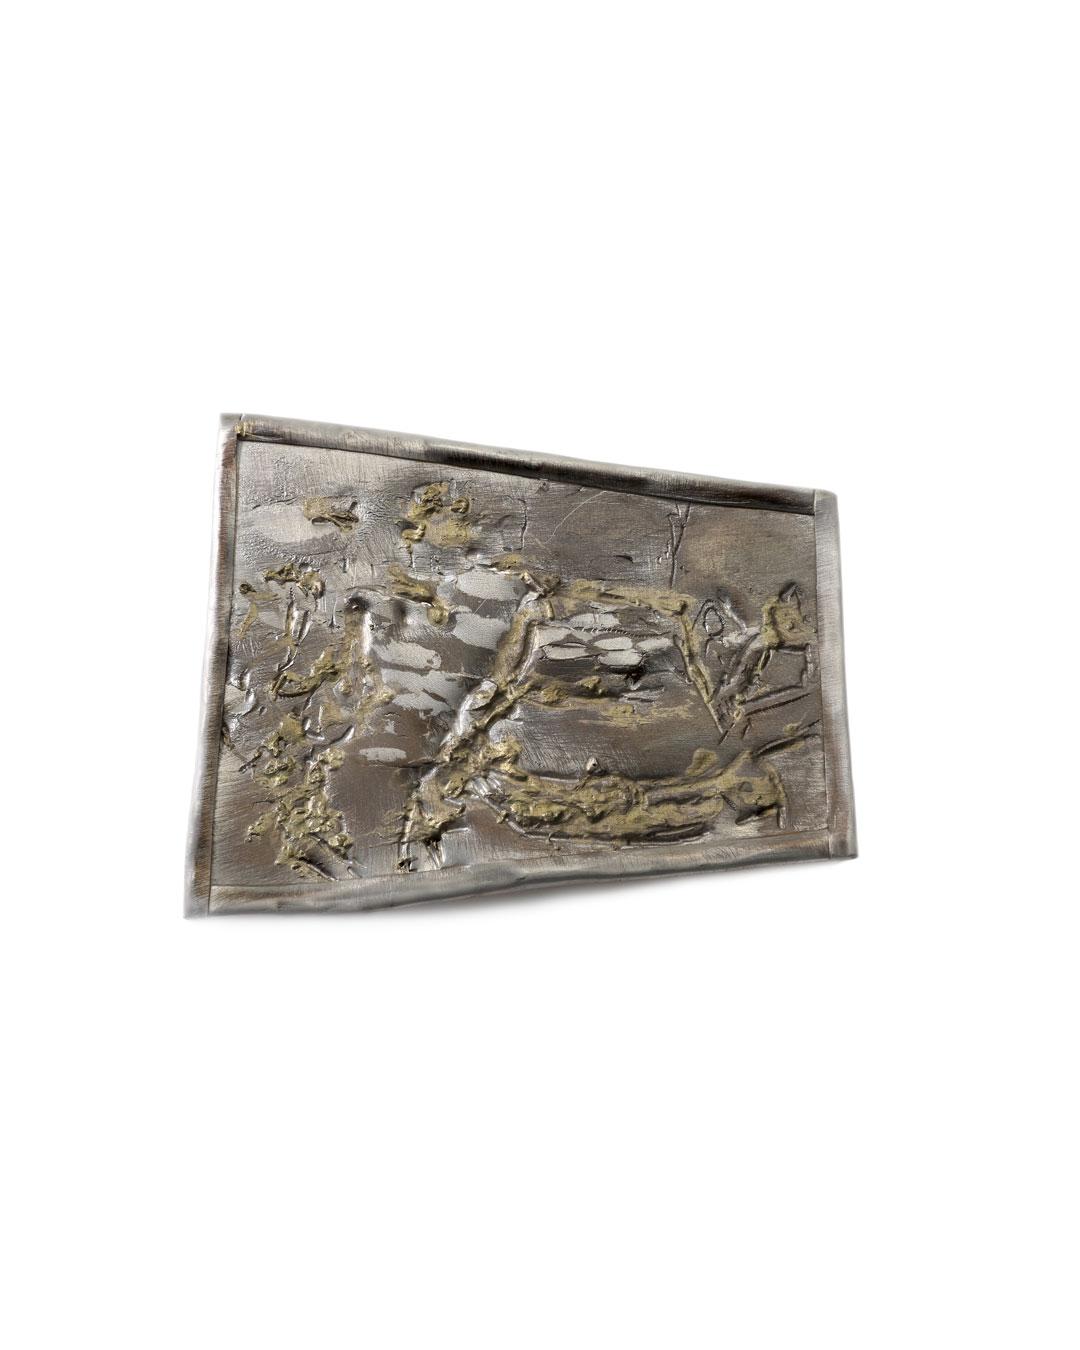 Rudolf Kocéa, Präsentation (Presentation), 2016, brooch; silver, copper, gold, 107 x 130 mm, €2200